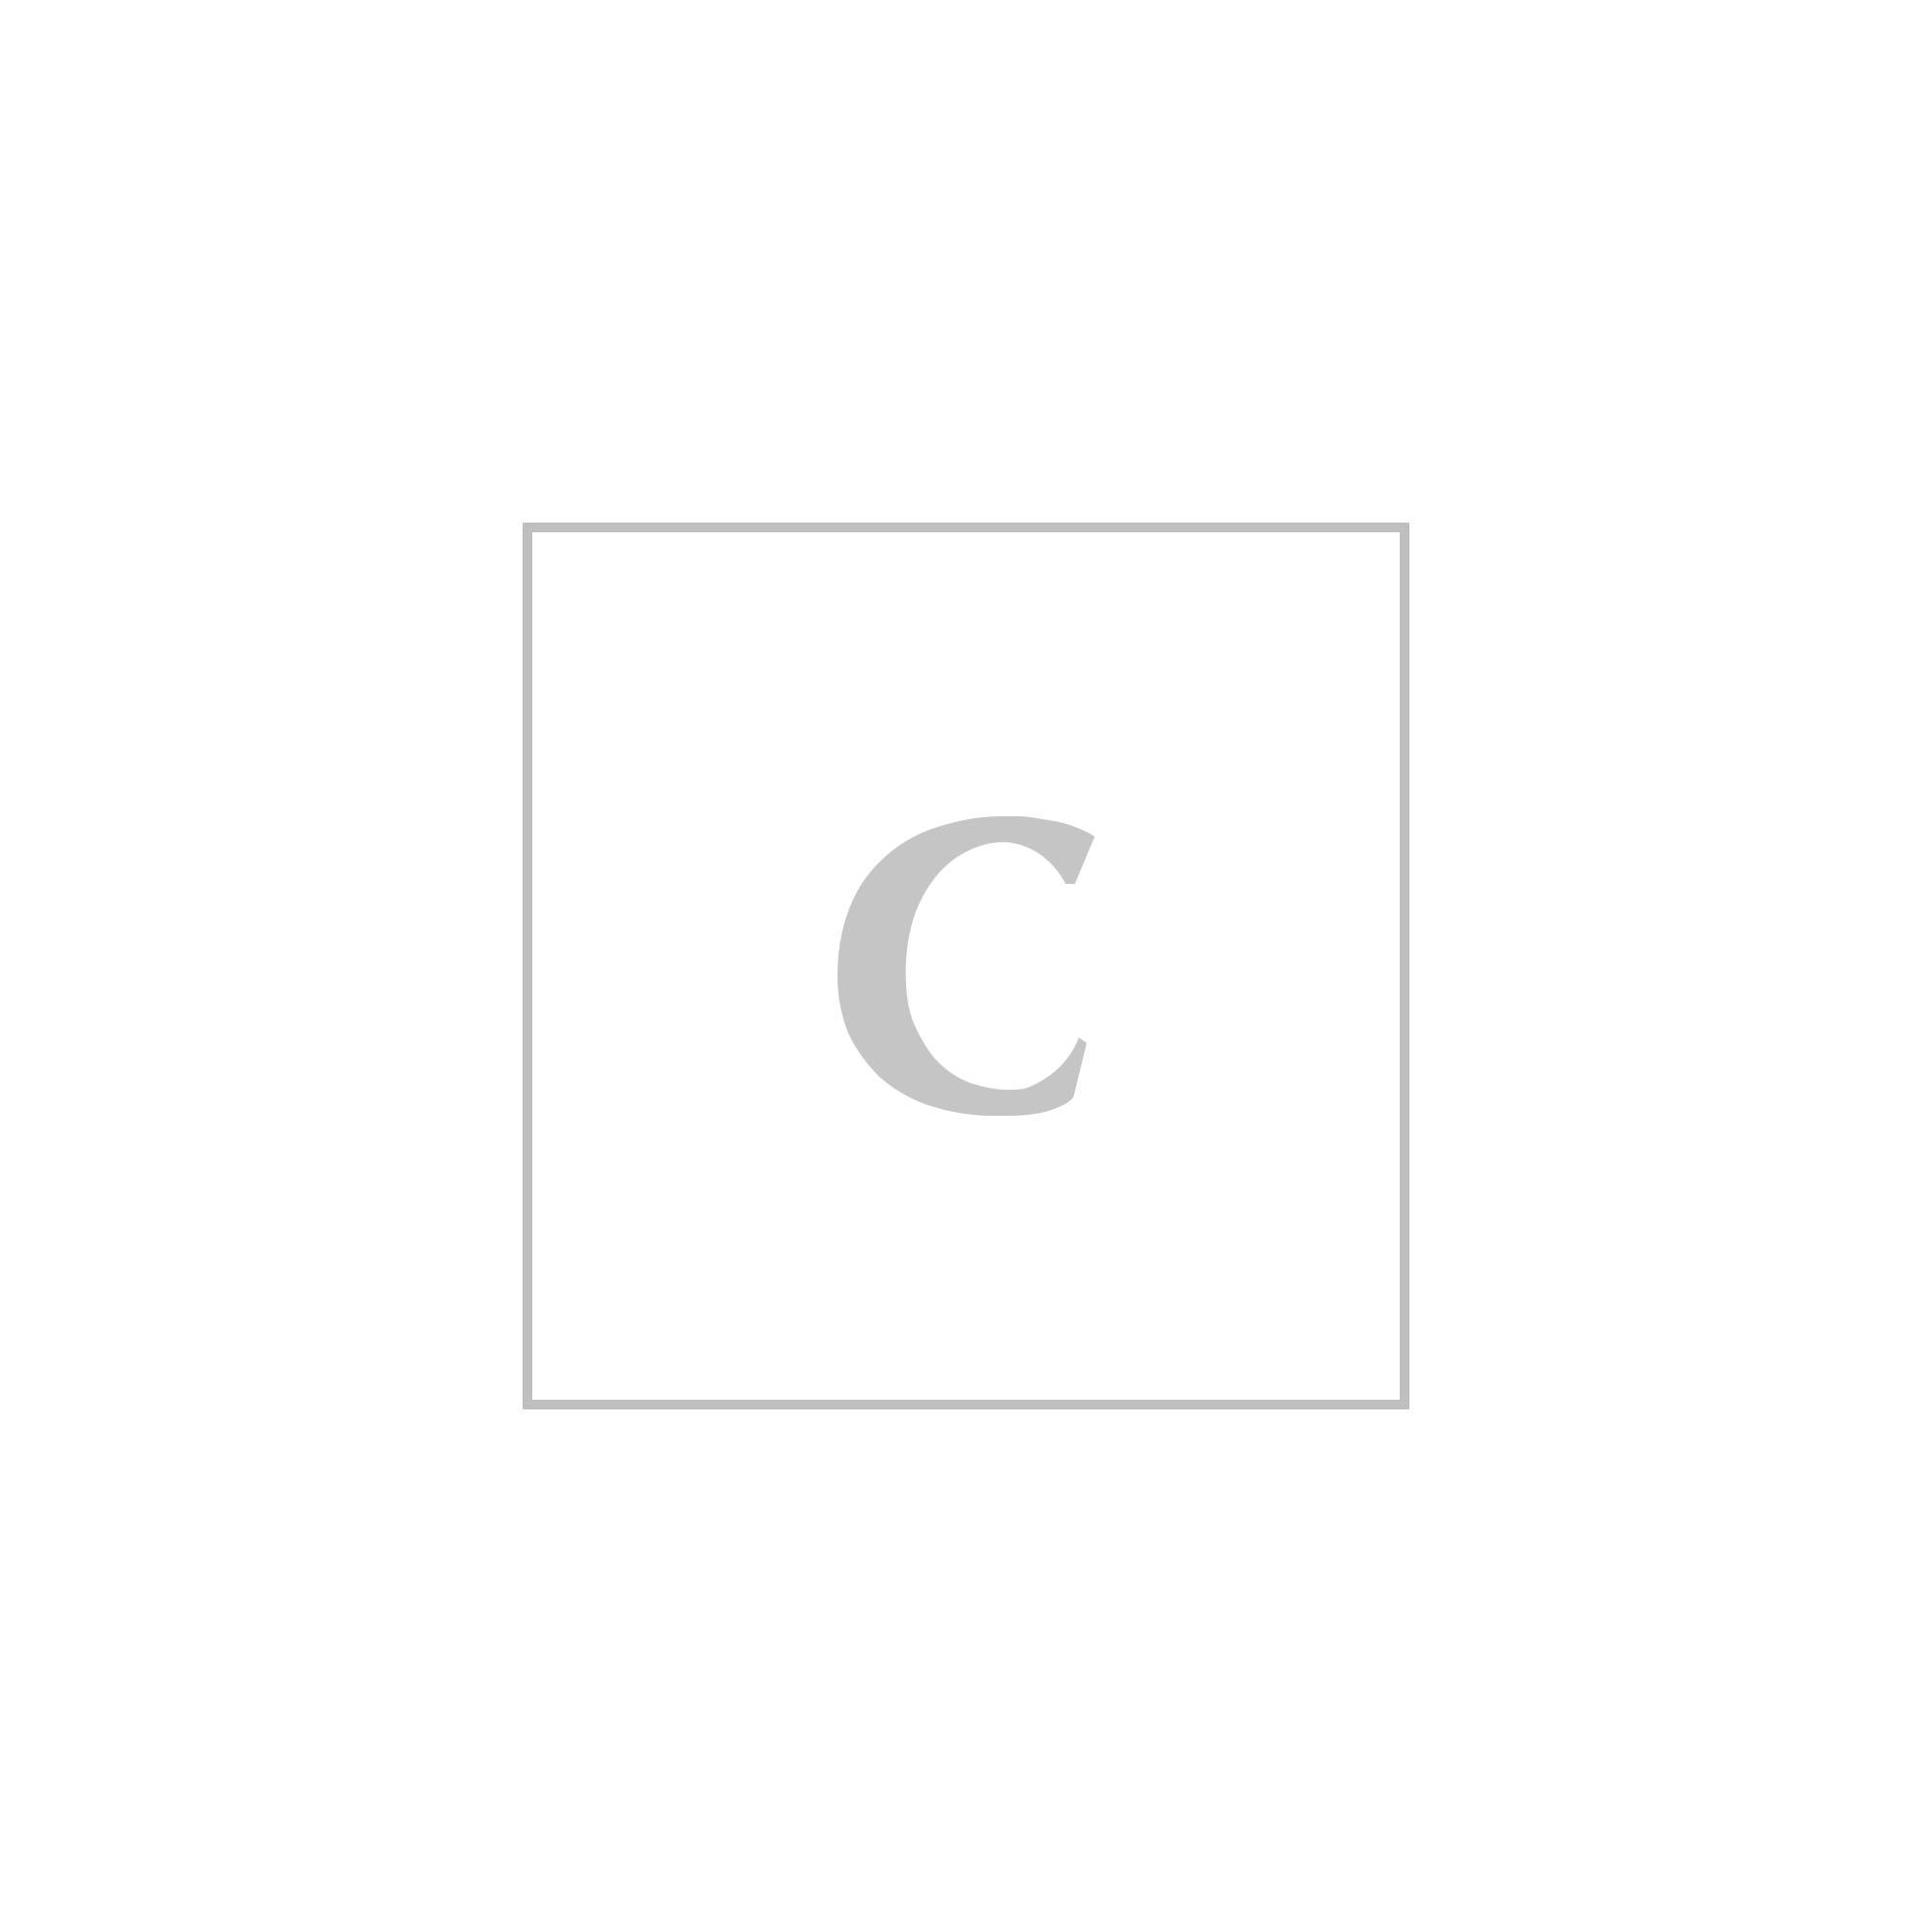 Saint laurent ysl borsa small monogram cabas